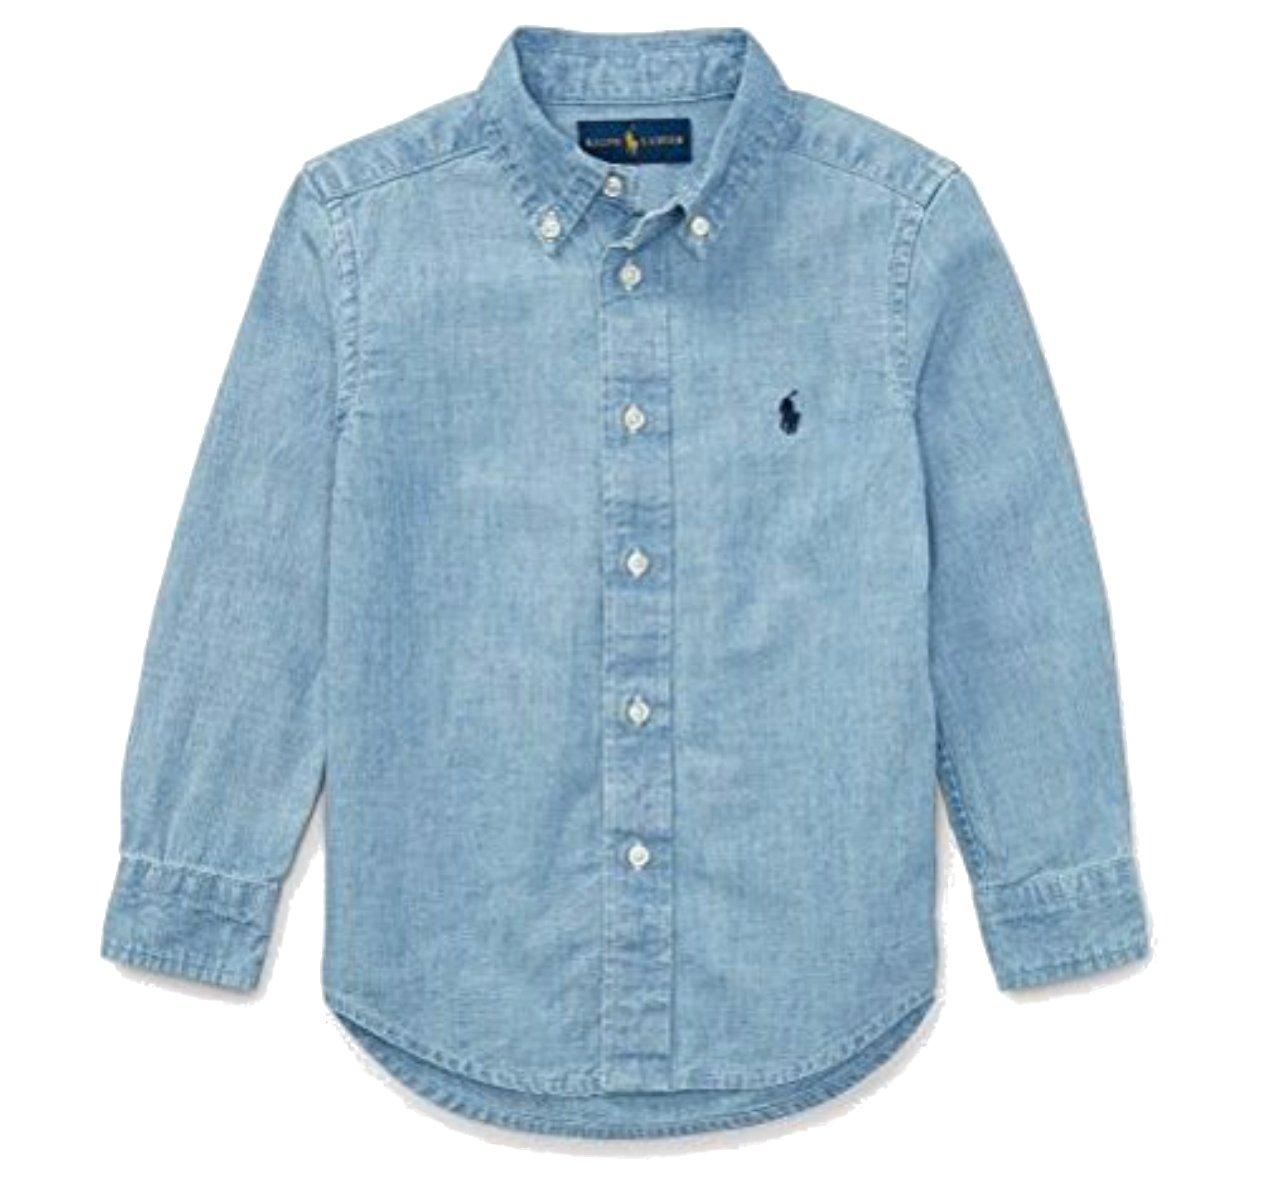 Ralph Lauren Boys Indigo Cotton Chambray Shirt (Small)